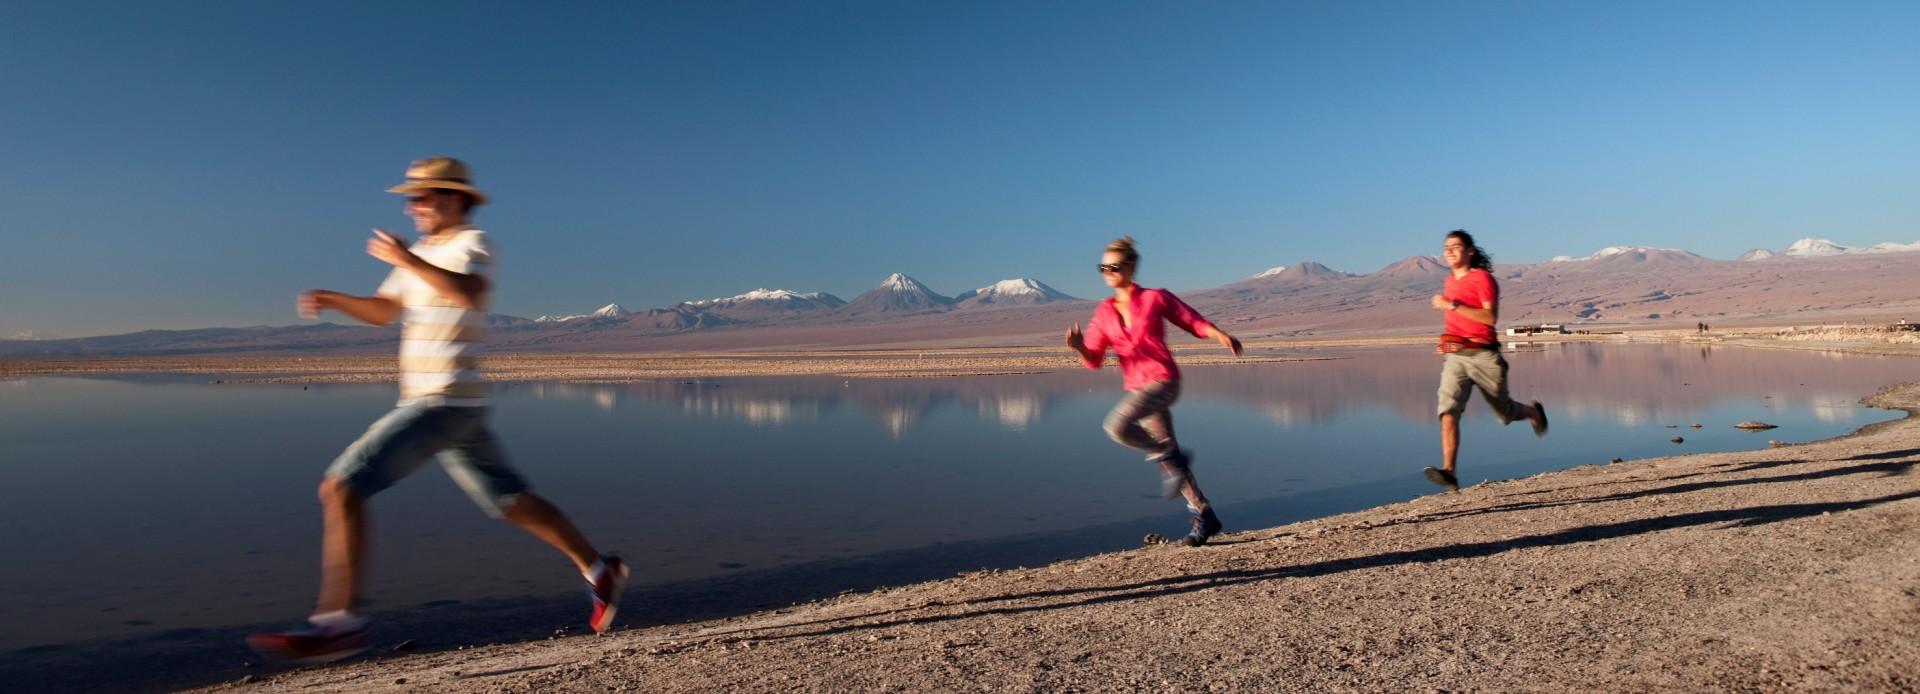 Chile Laguna Chaxa in der Atacama Wüste